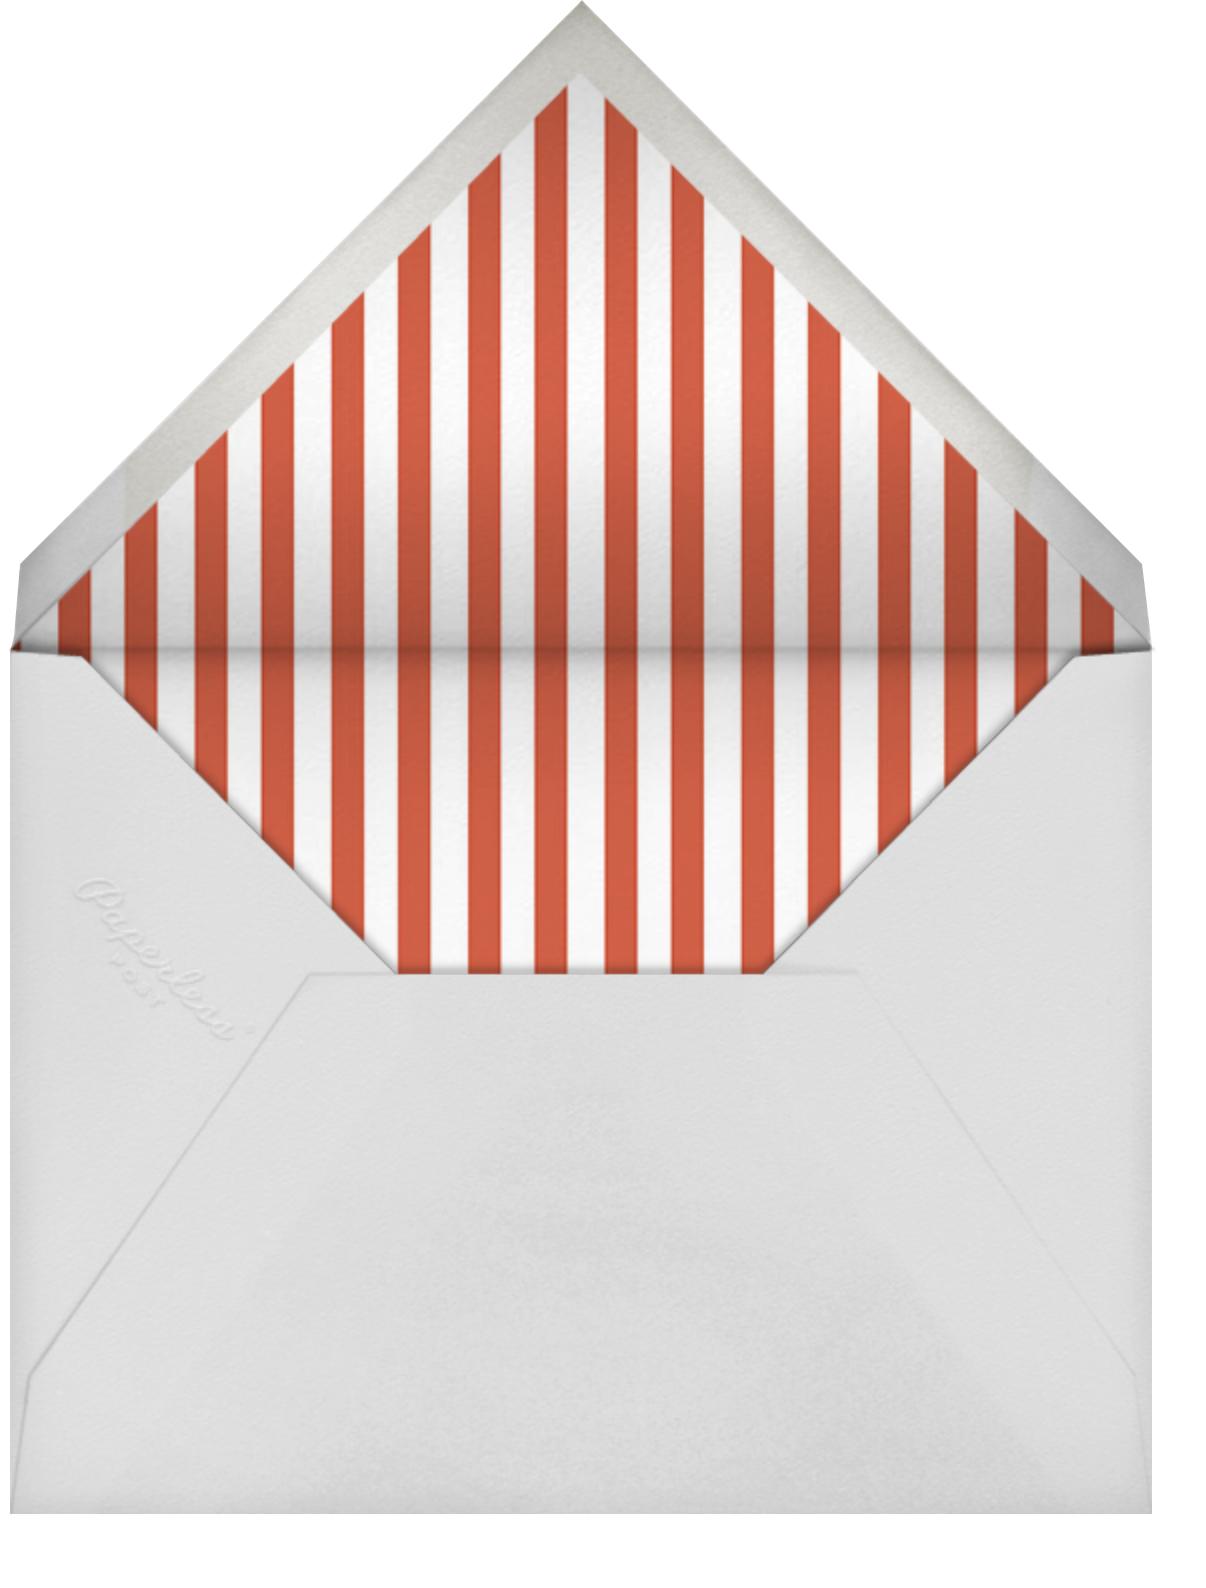 Bucket of Popcorn - Slate - Paperless Post - Envelope